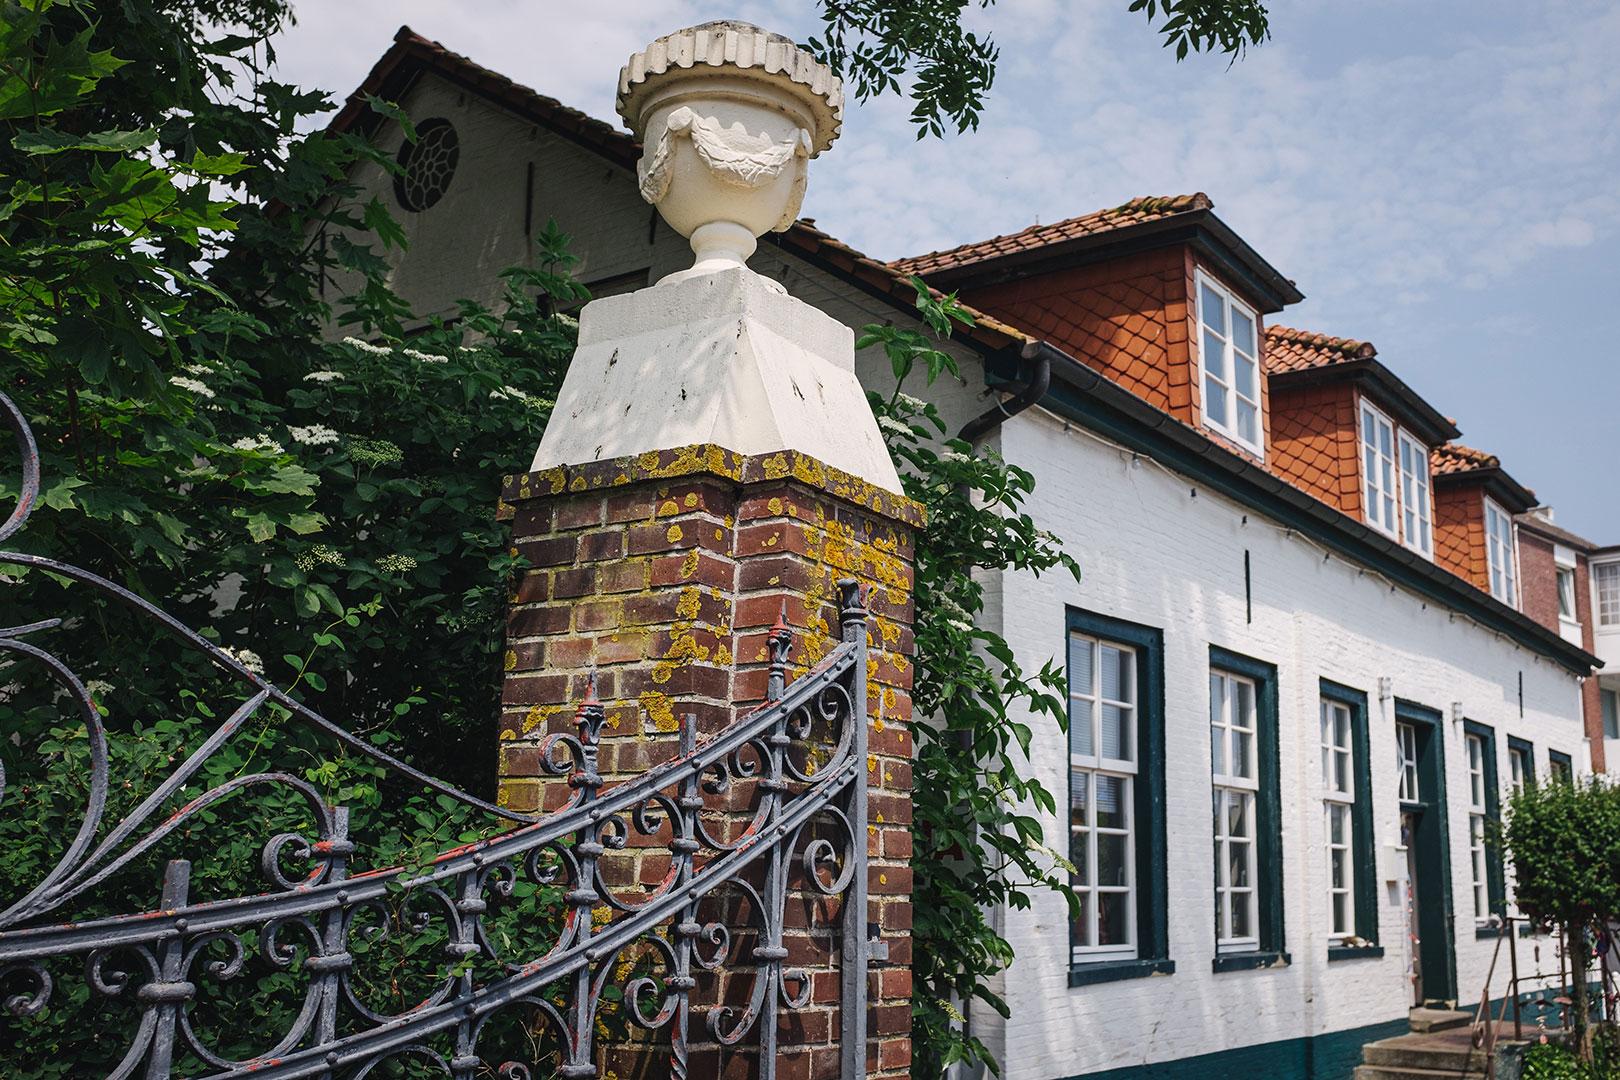 Haus in Neuharlingersiel